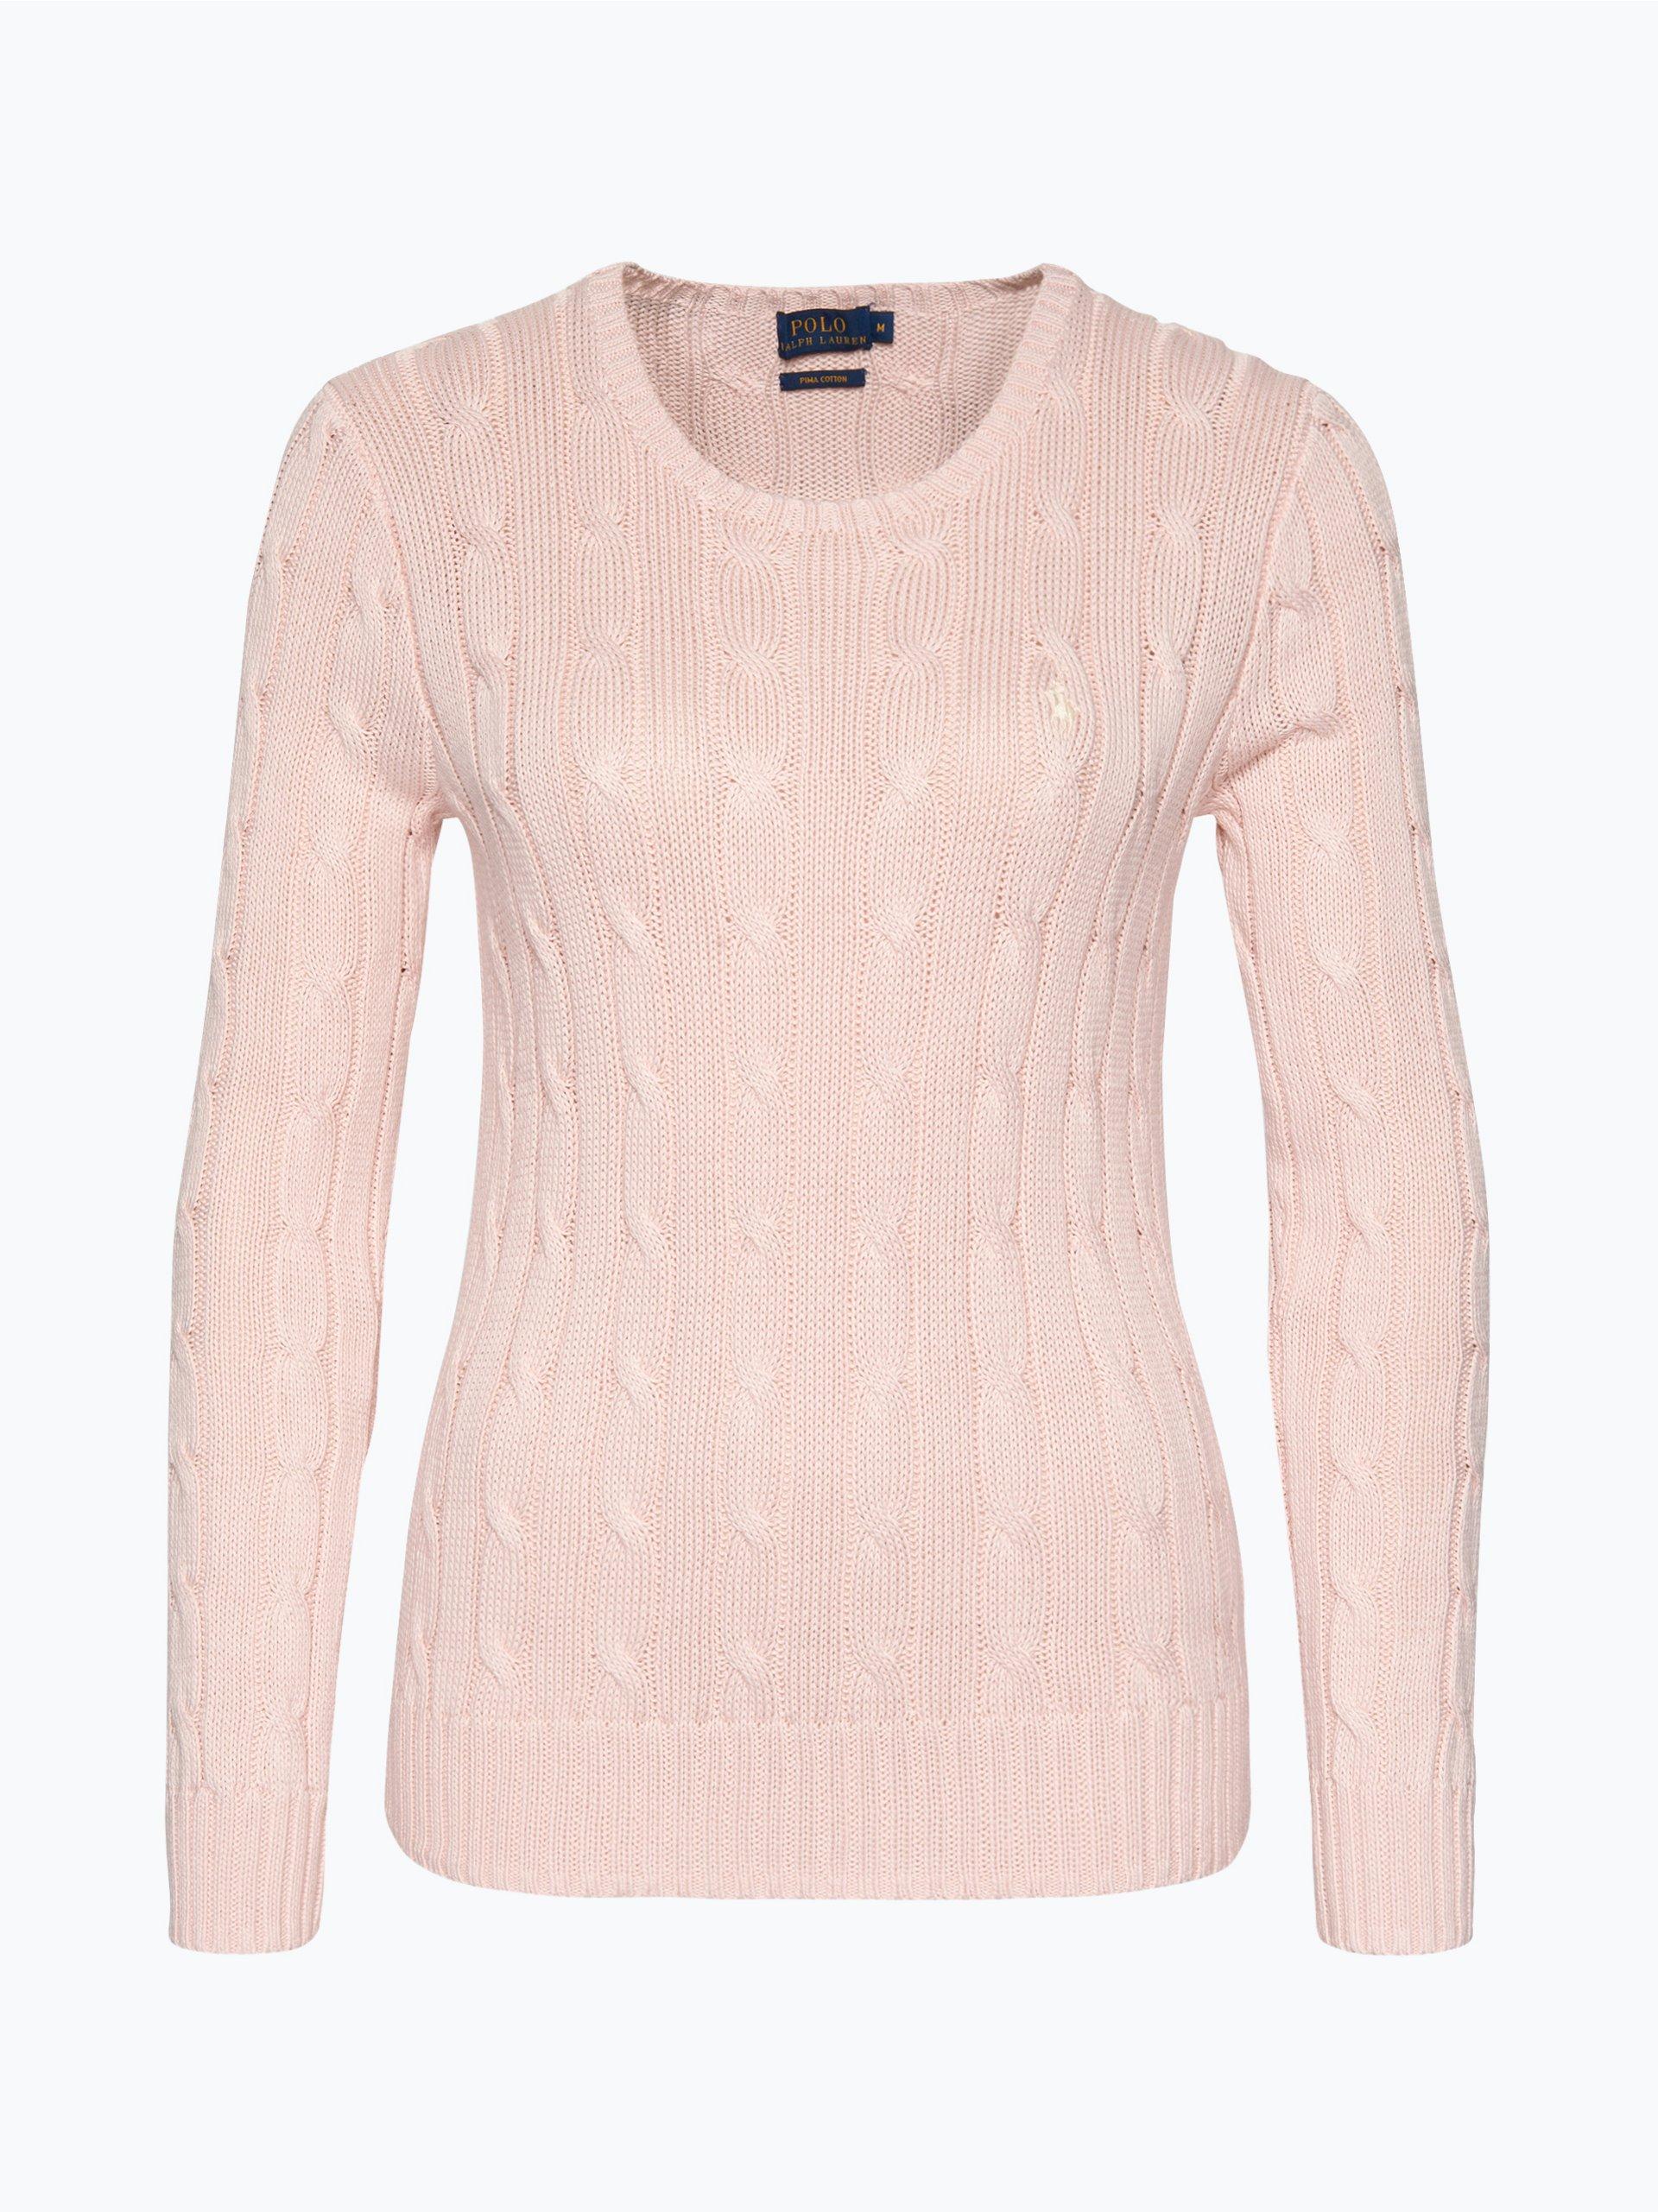 polo ralph lauren damen pullover rosa uni online kaufen. Black Bedroom Furniture Sets. Home Design Ideas